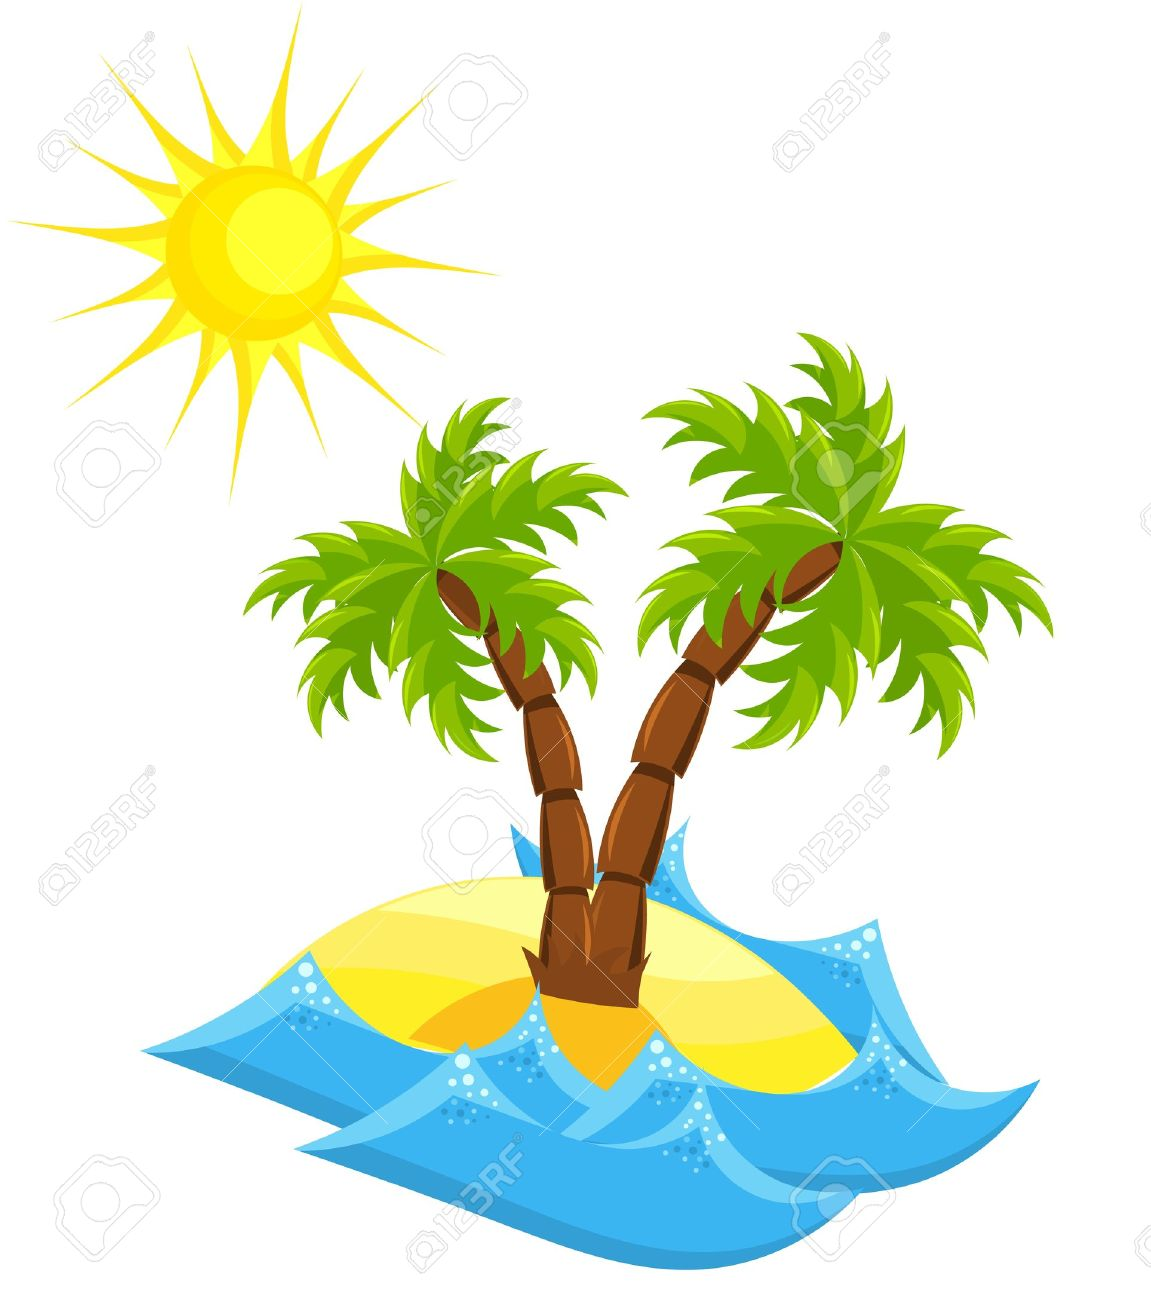 Summer vacation island. Stock Vector - 10045661